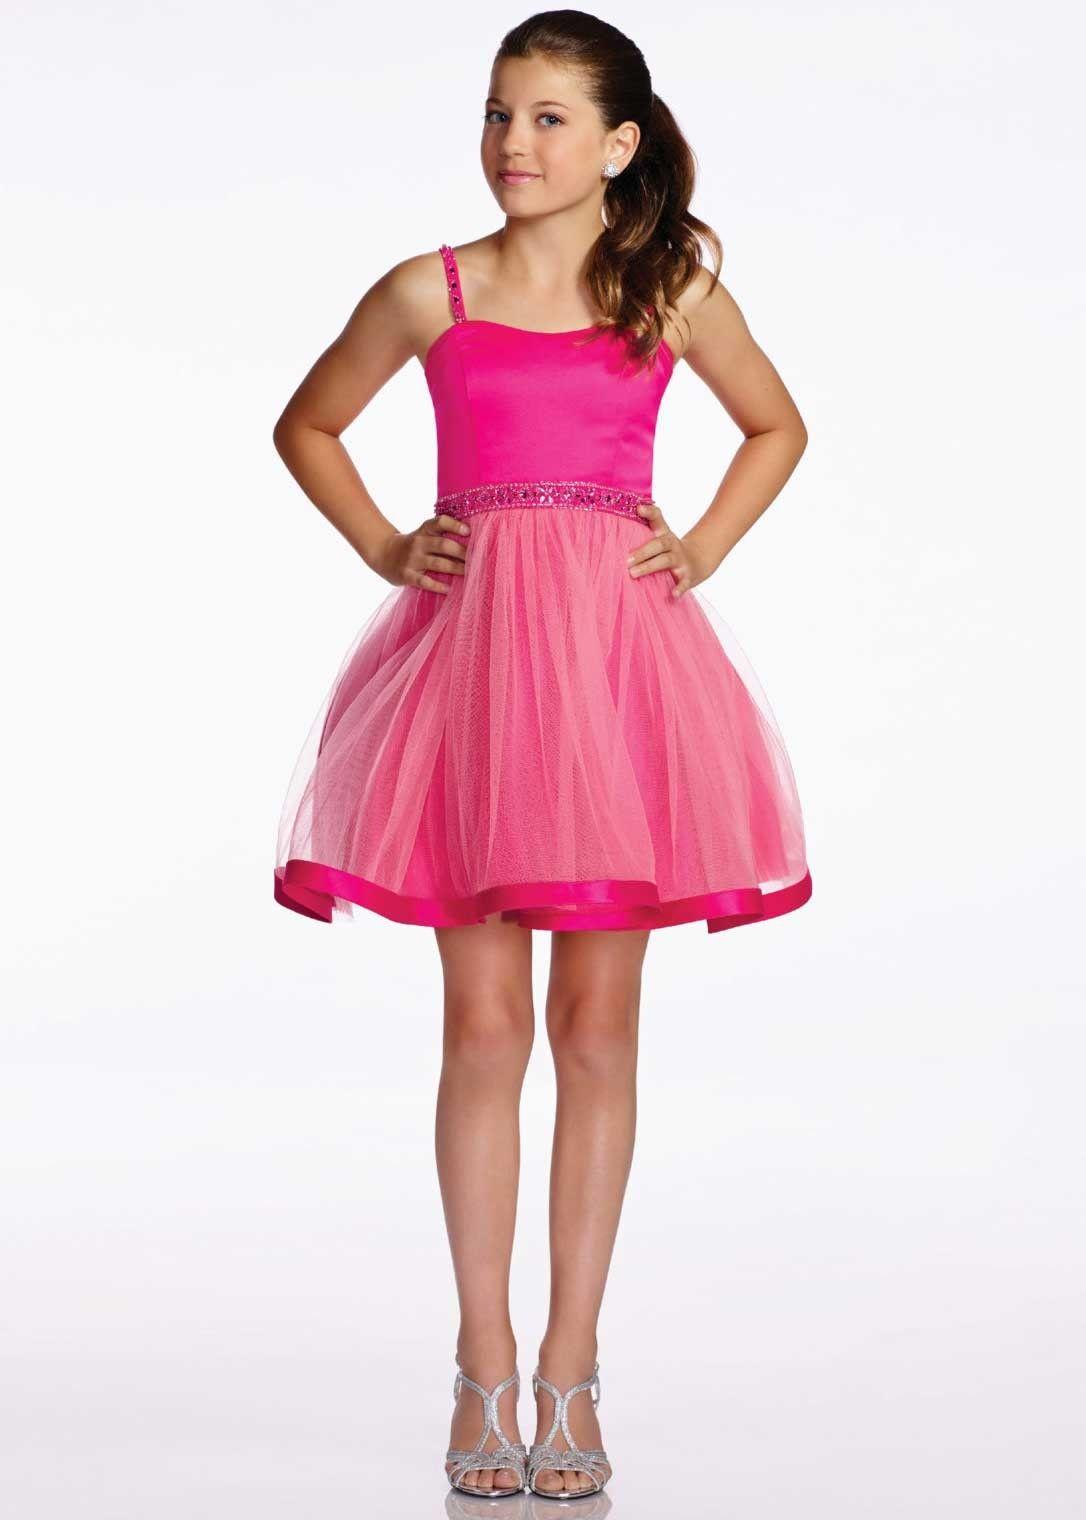 Lexie by Mon Cheri TW11664 Sleeveless Girls Party Dress   Vestidos ...